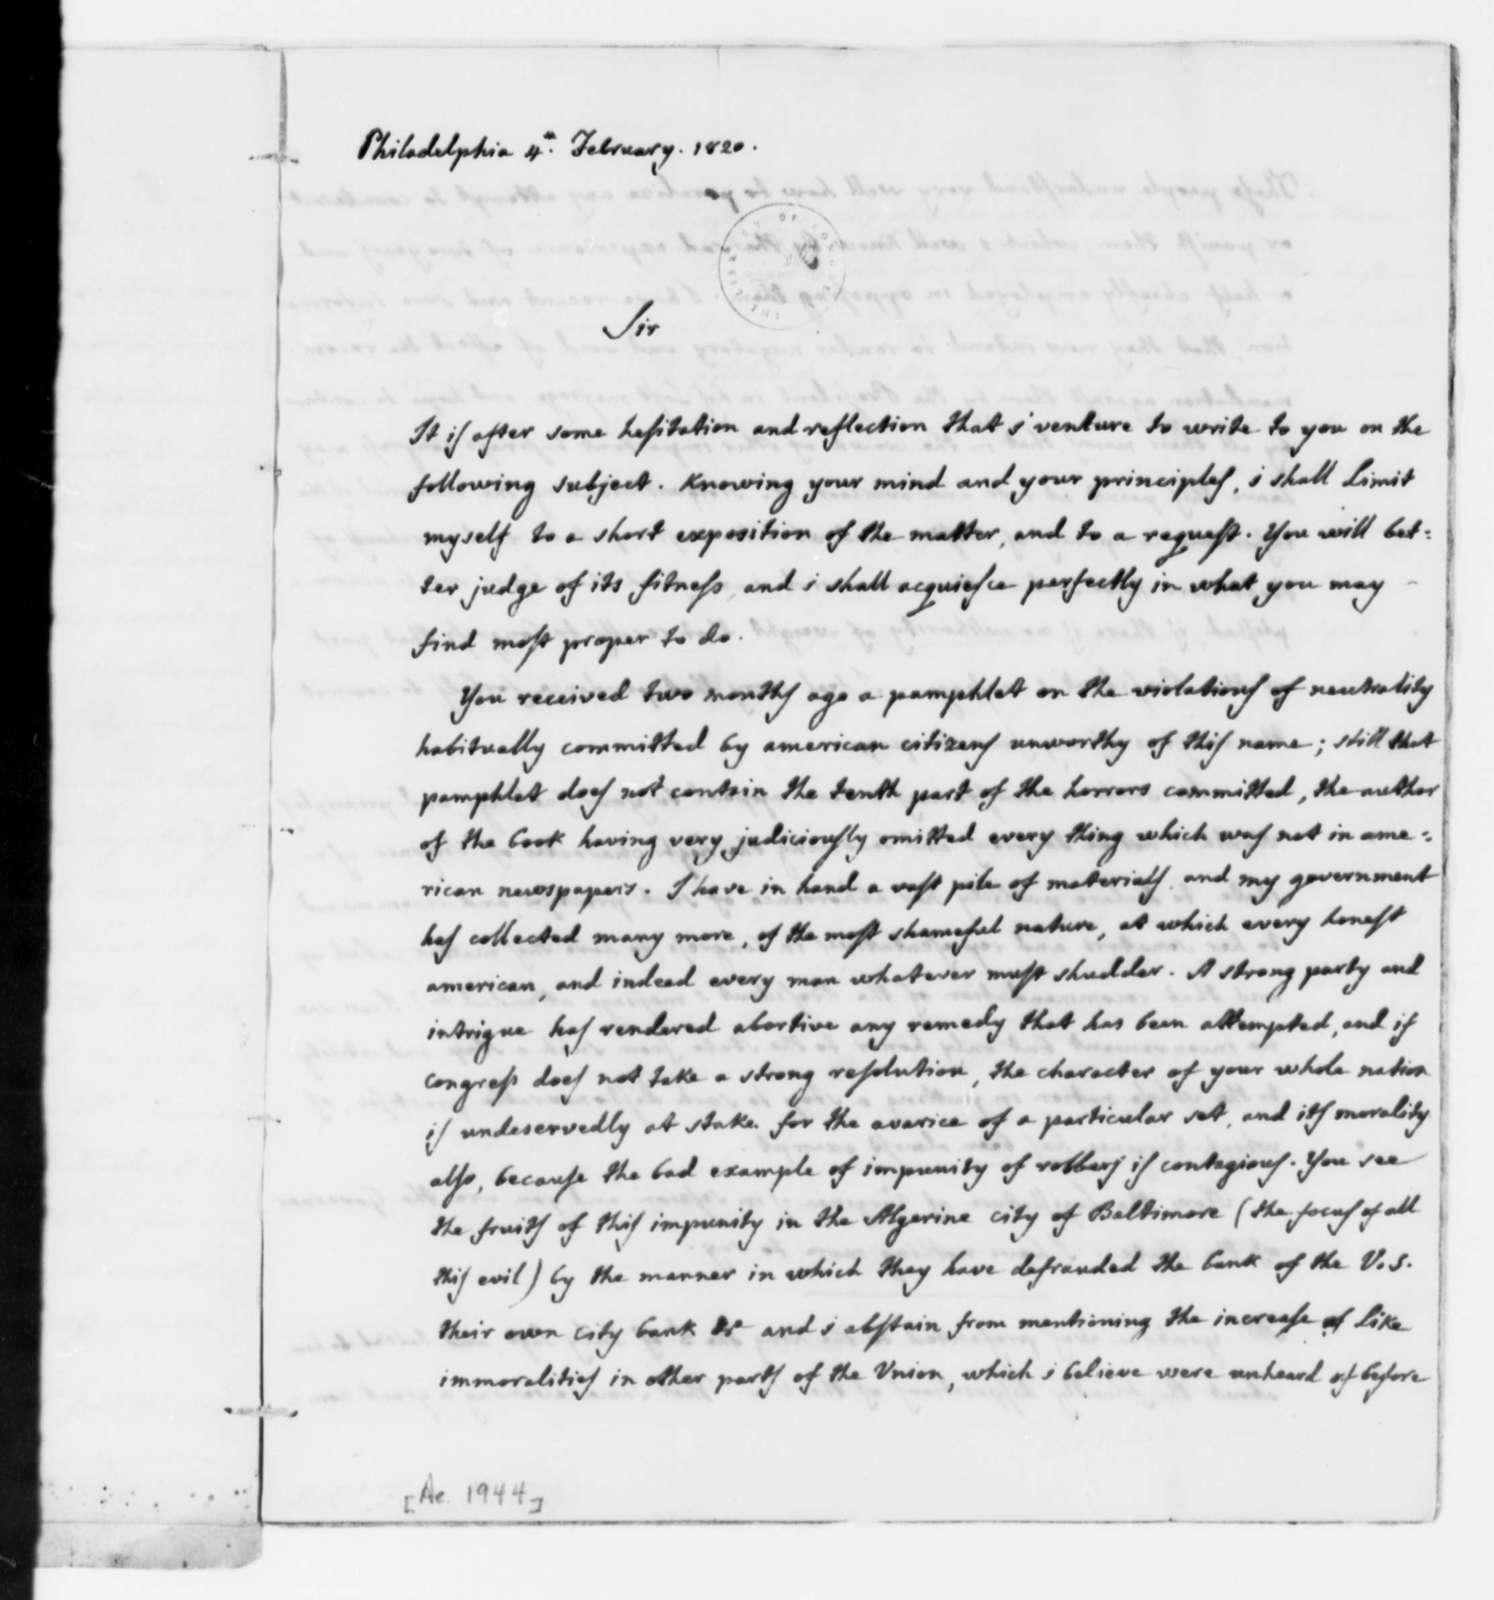 Jose Correa da Serra to Thomas Mann Randolph, Jr., February 4, 1820